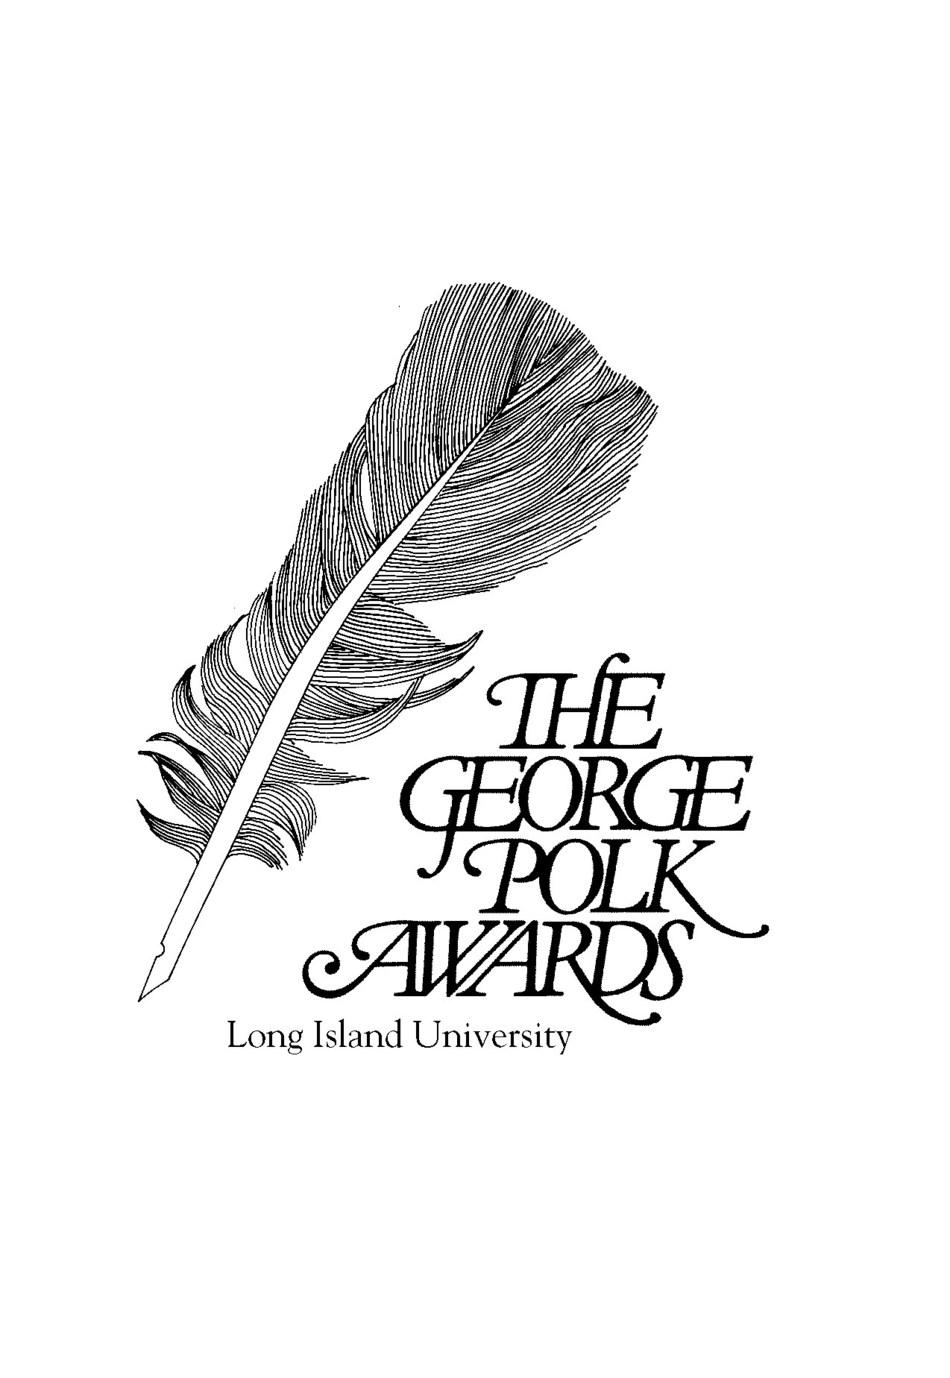 The George Polk Awards (PRNewsfoto/Long Island University)